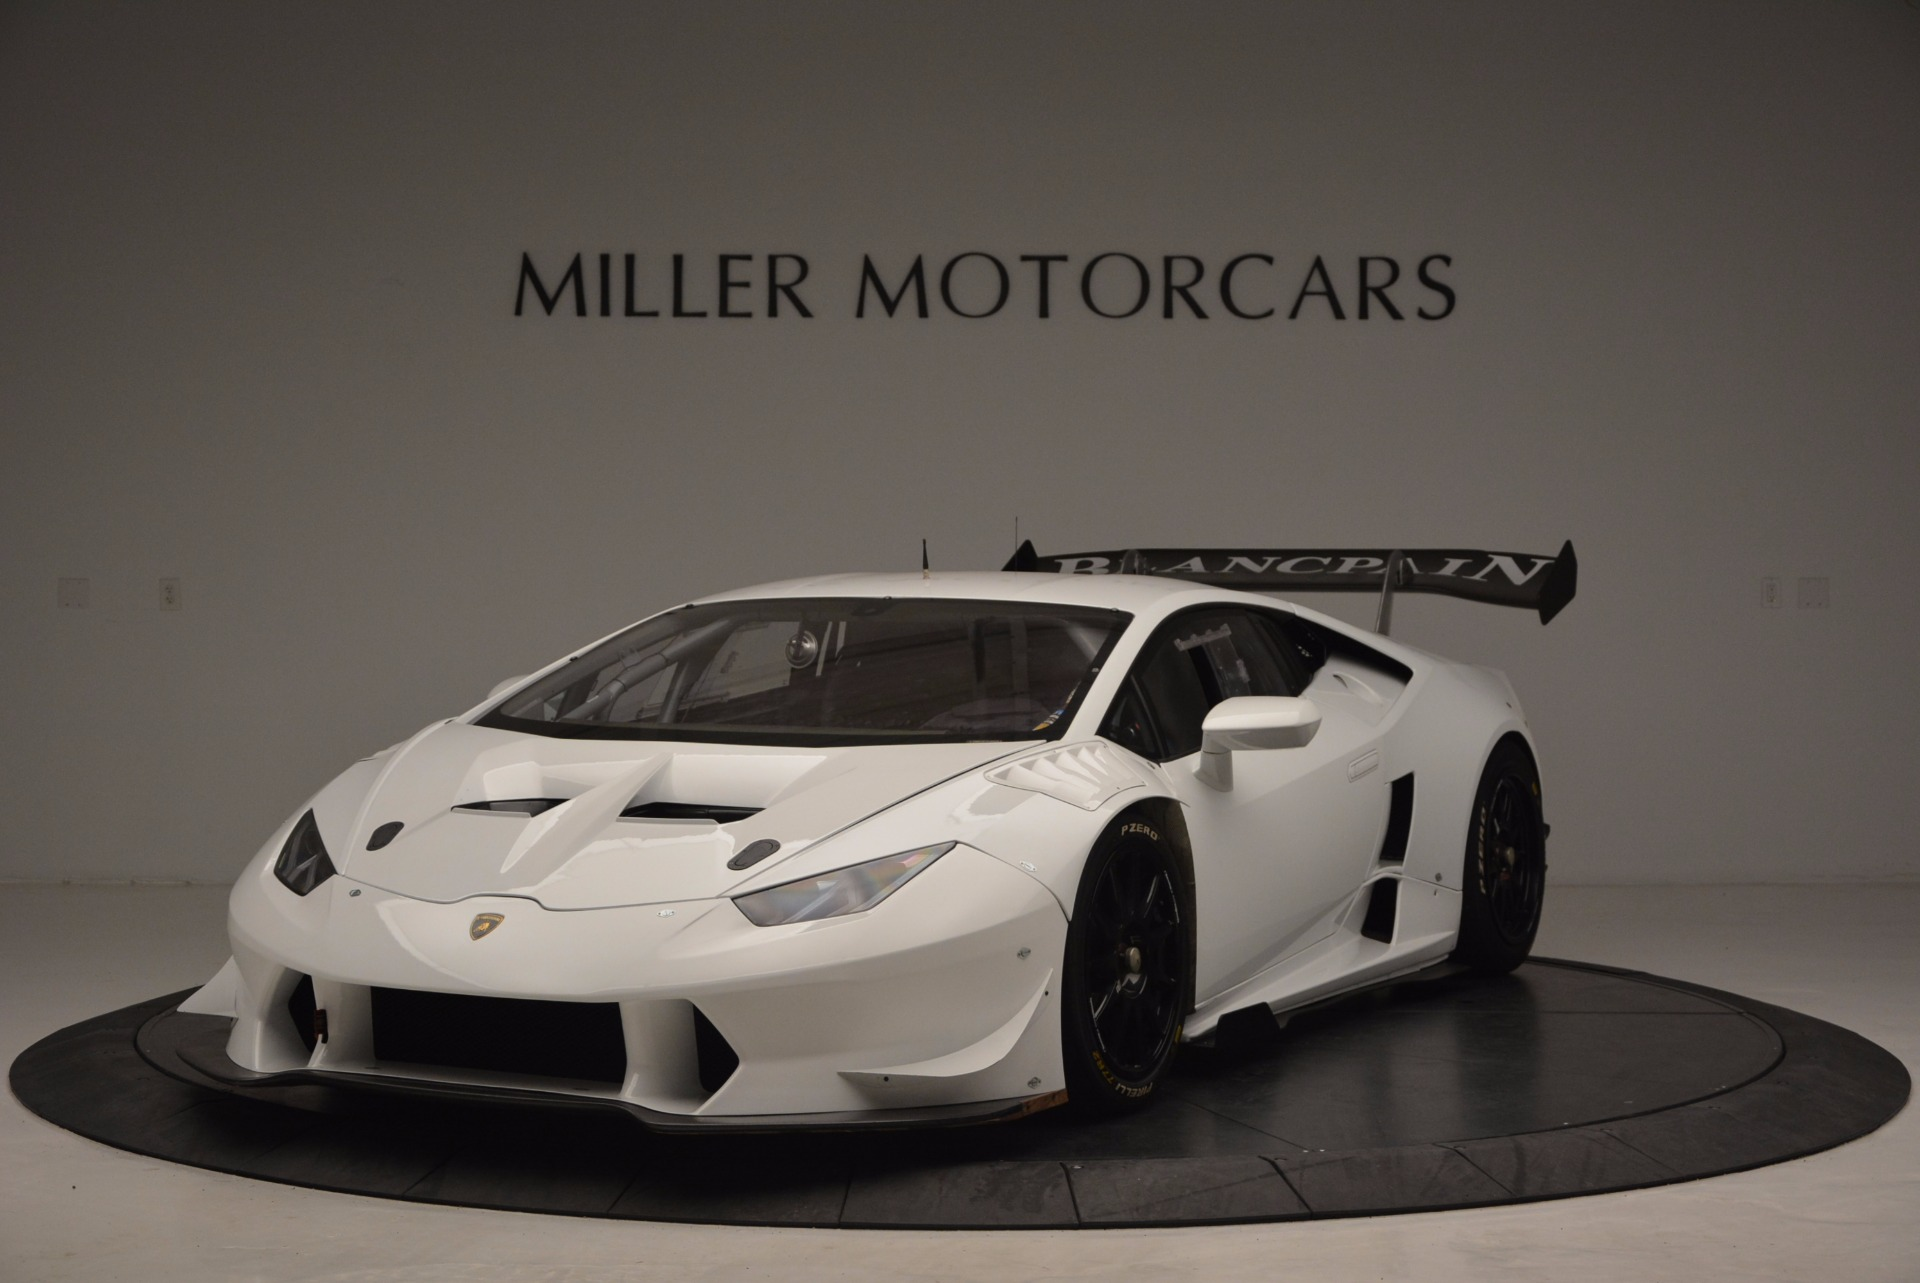 Used 2015 Lamborghini Huracan Lp 620 2 Super Trofeo For Sale